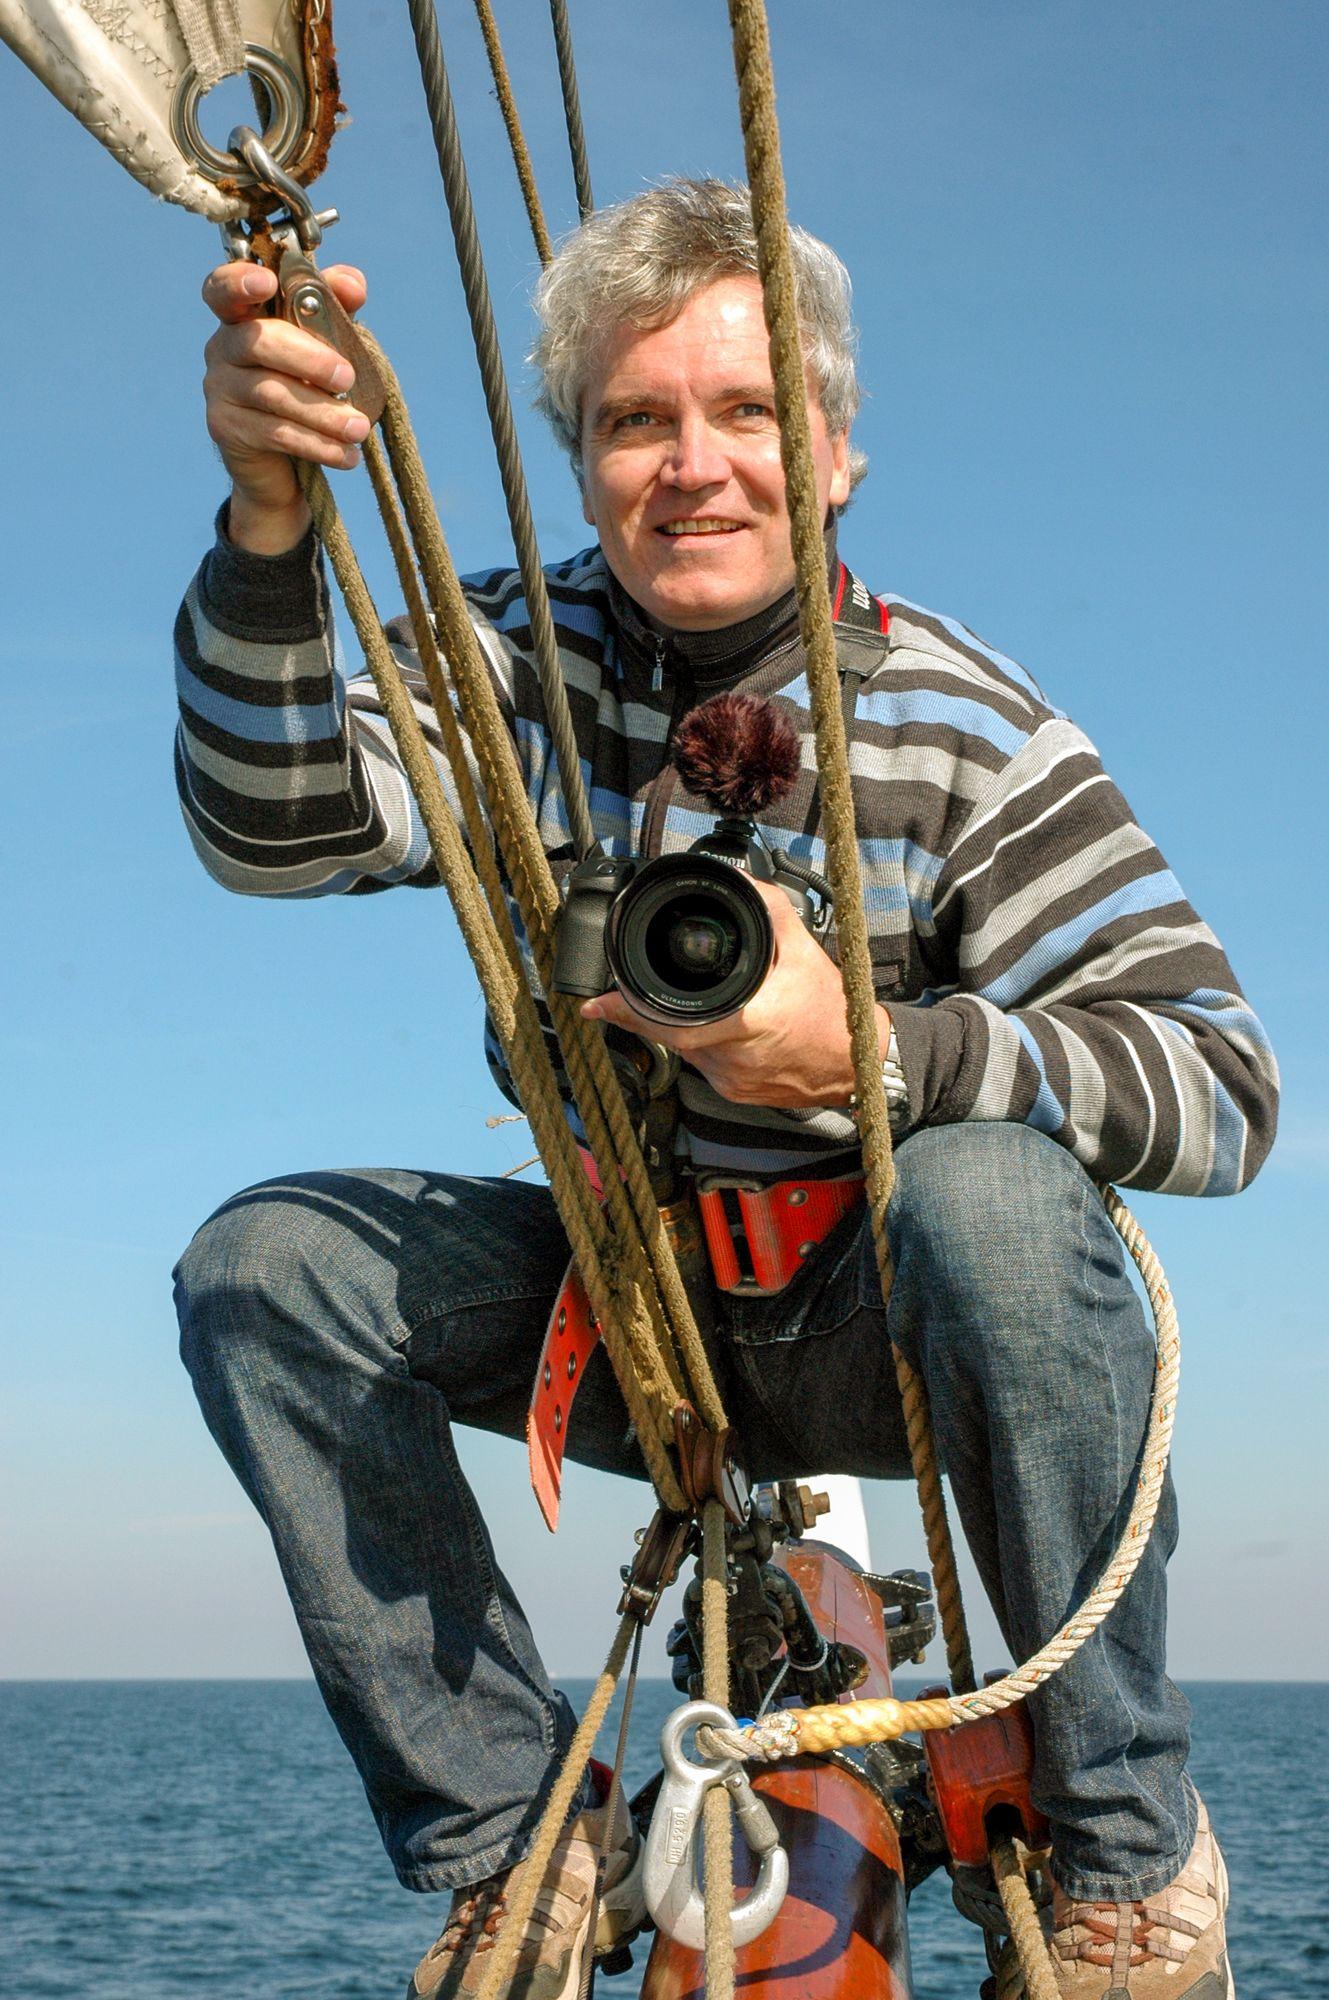 Fotograf Svend Krumnacker 2009 Canon 5D II 24mm/1.4 L